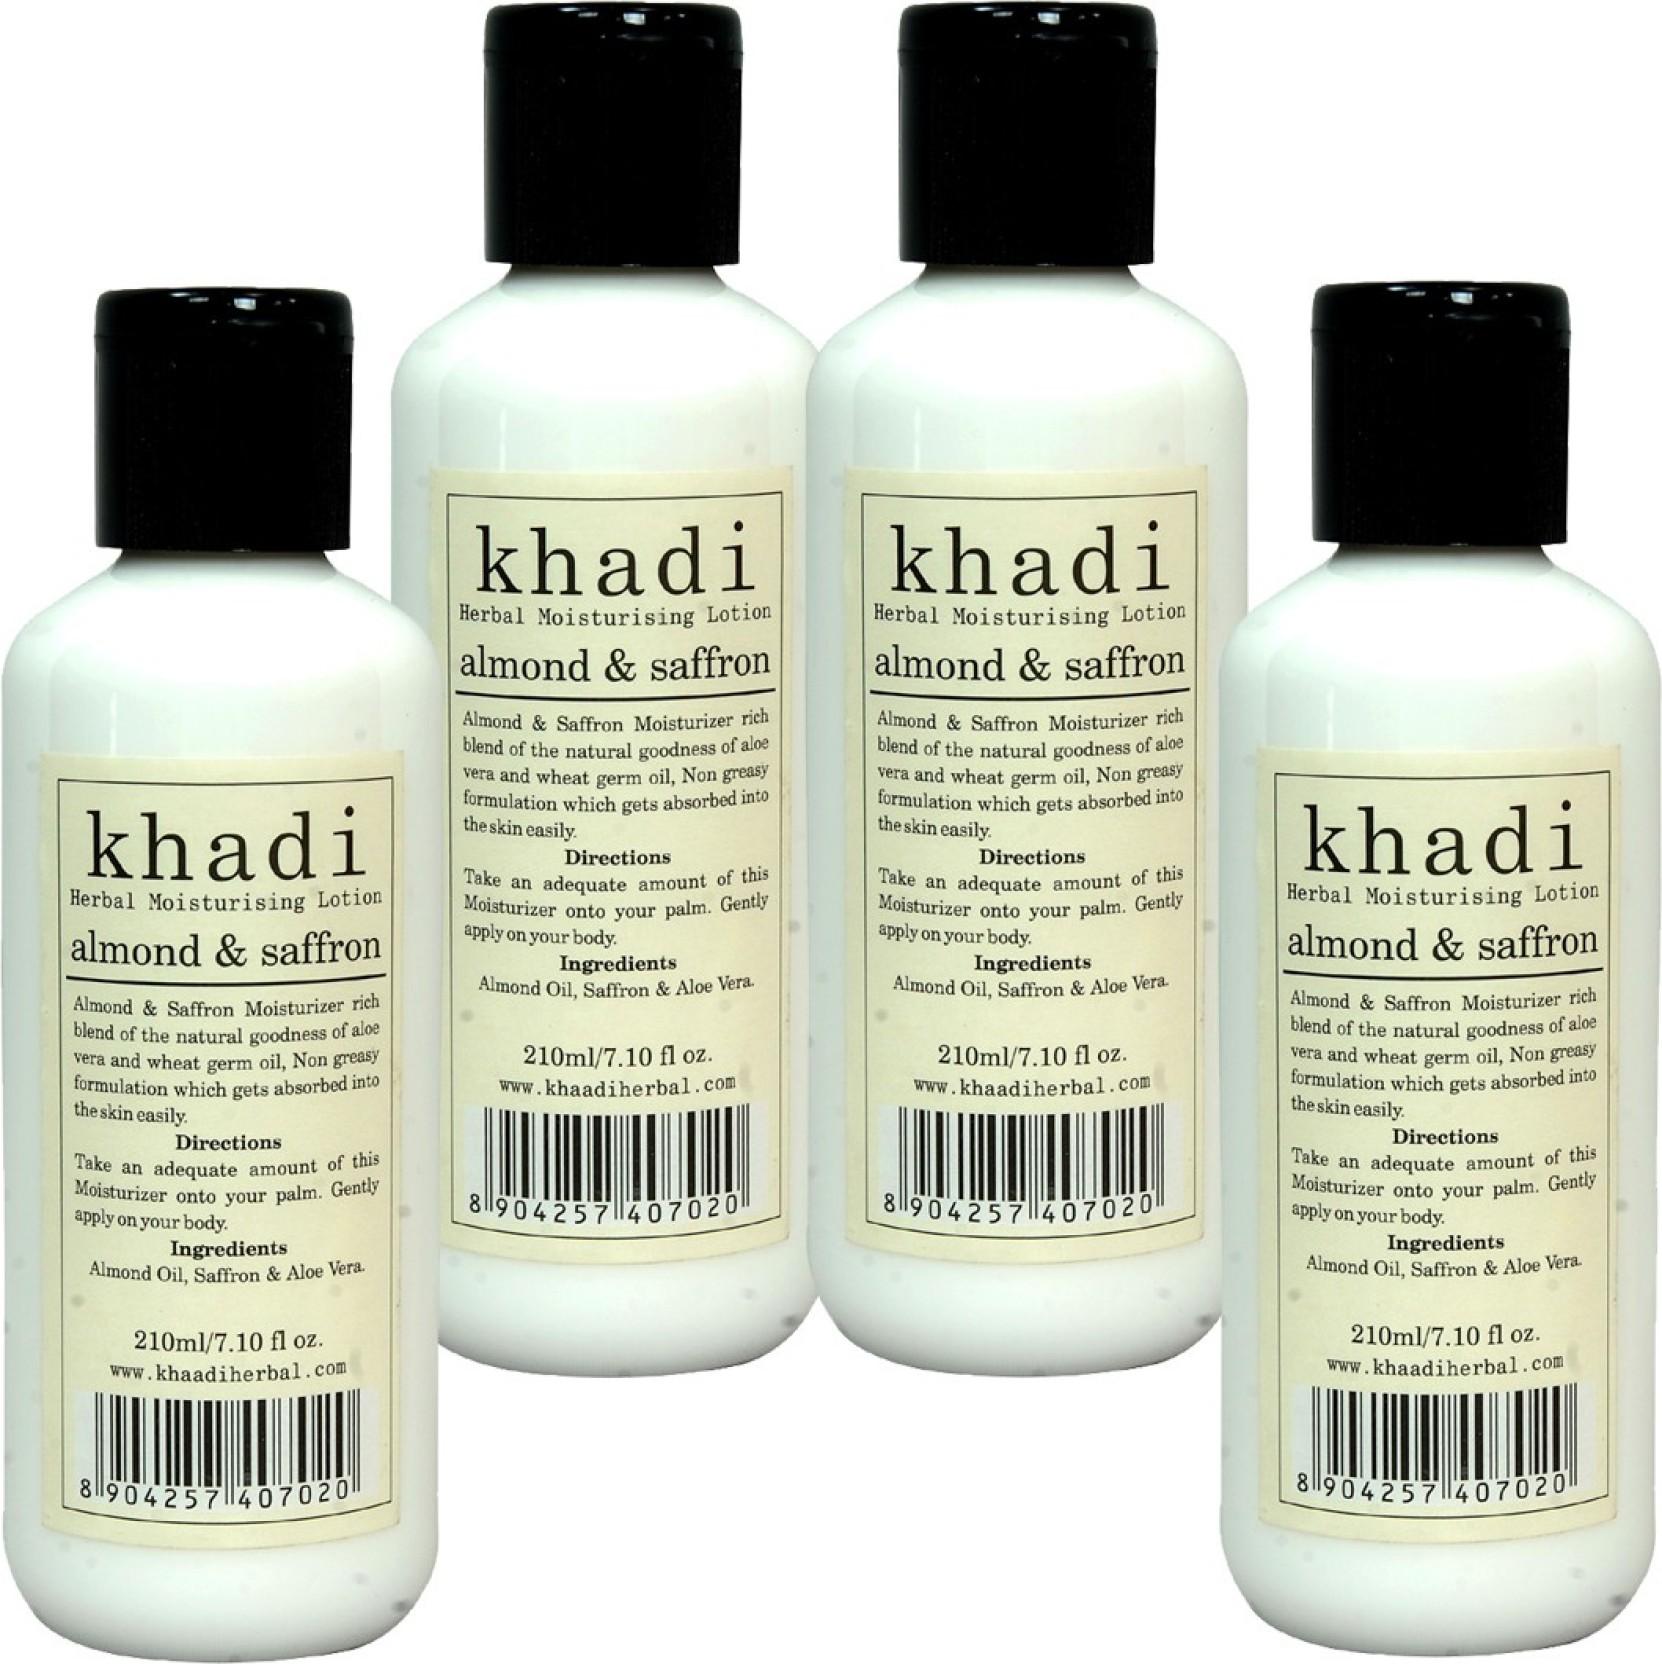 Khadi Herbal Almond & Saffron Moisturising Lotion - Price in